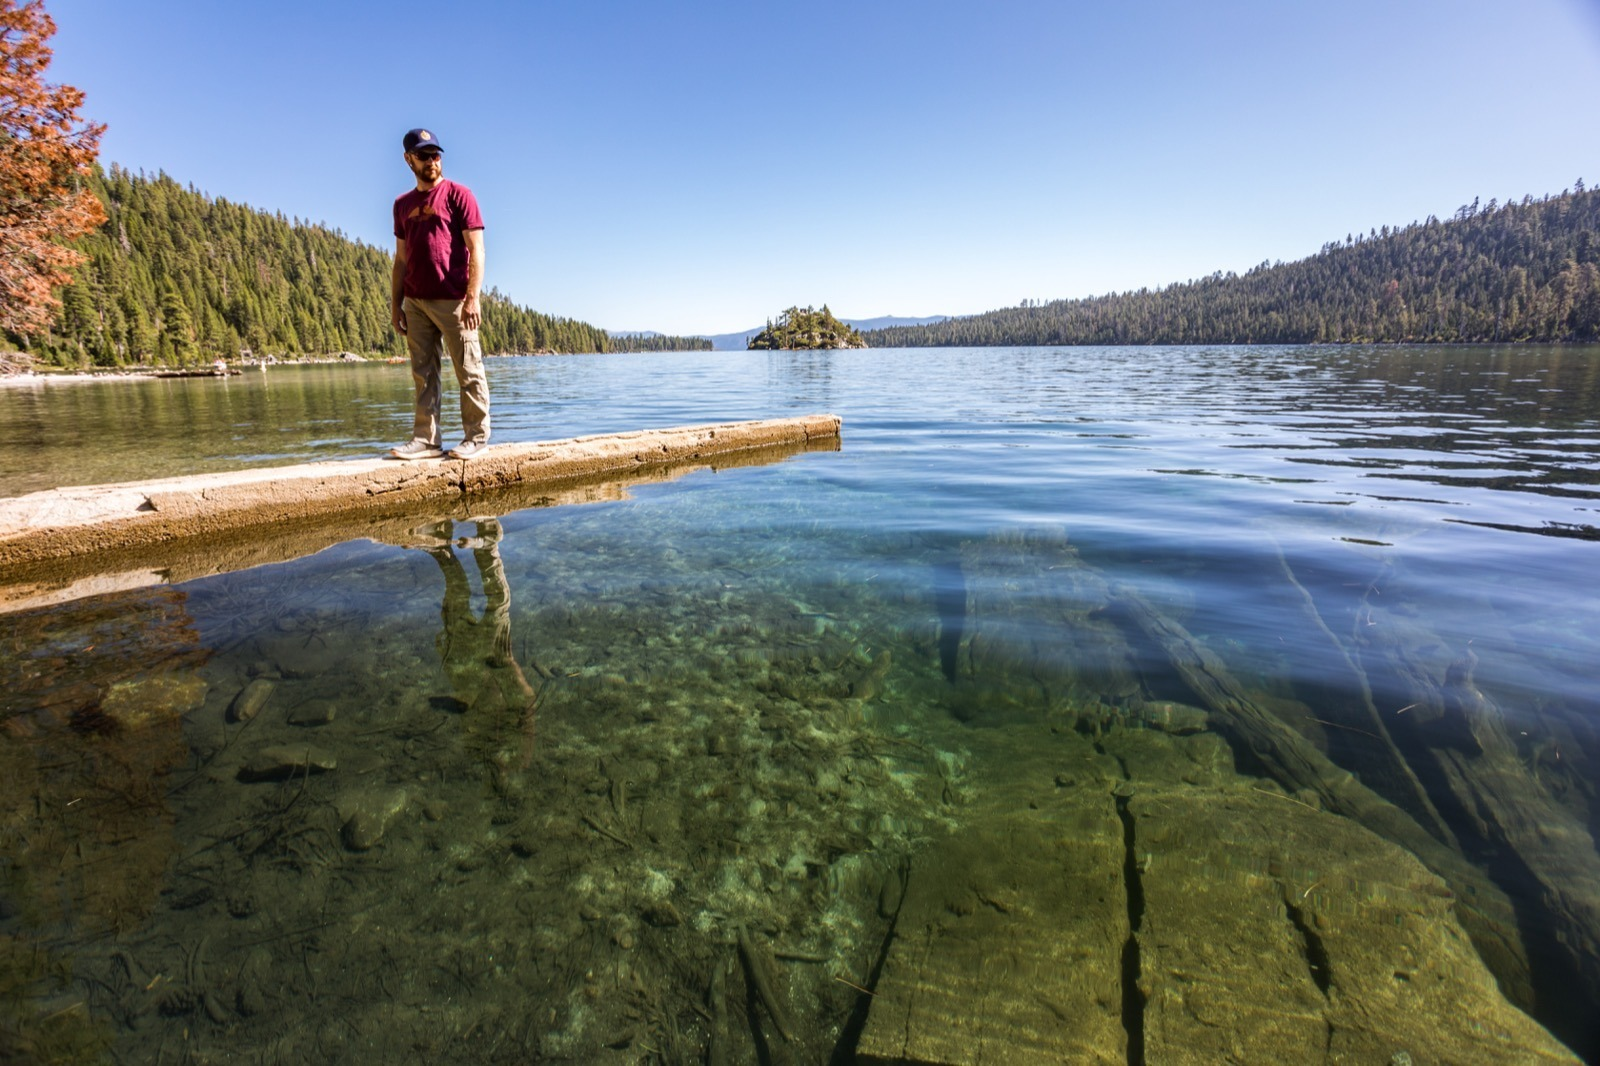 california-high-sierra-south-lake-tahoe-emerald-bay-3